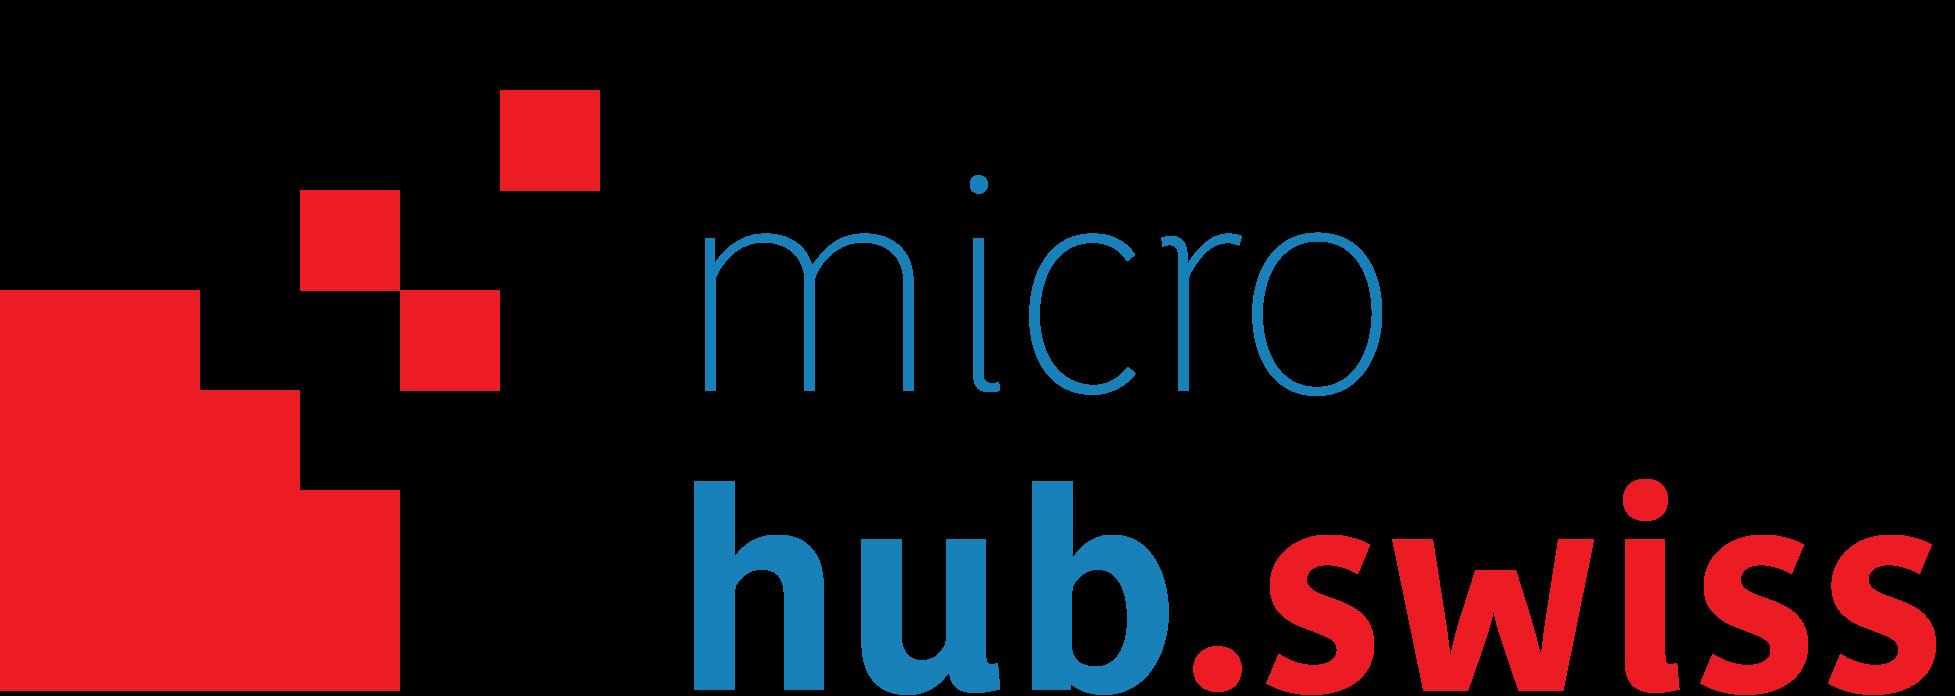 microhub.swiss